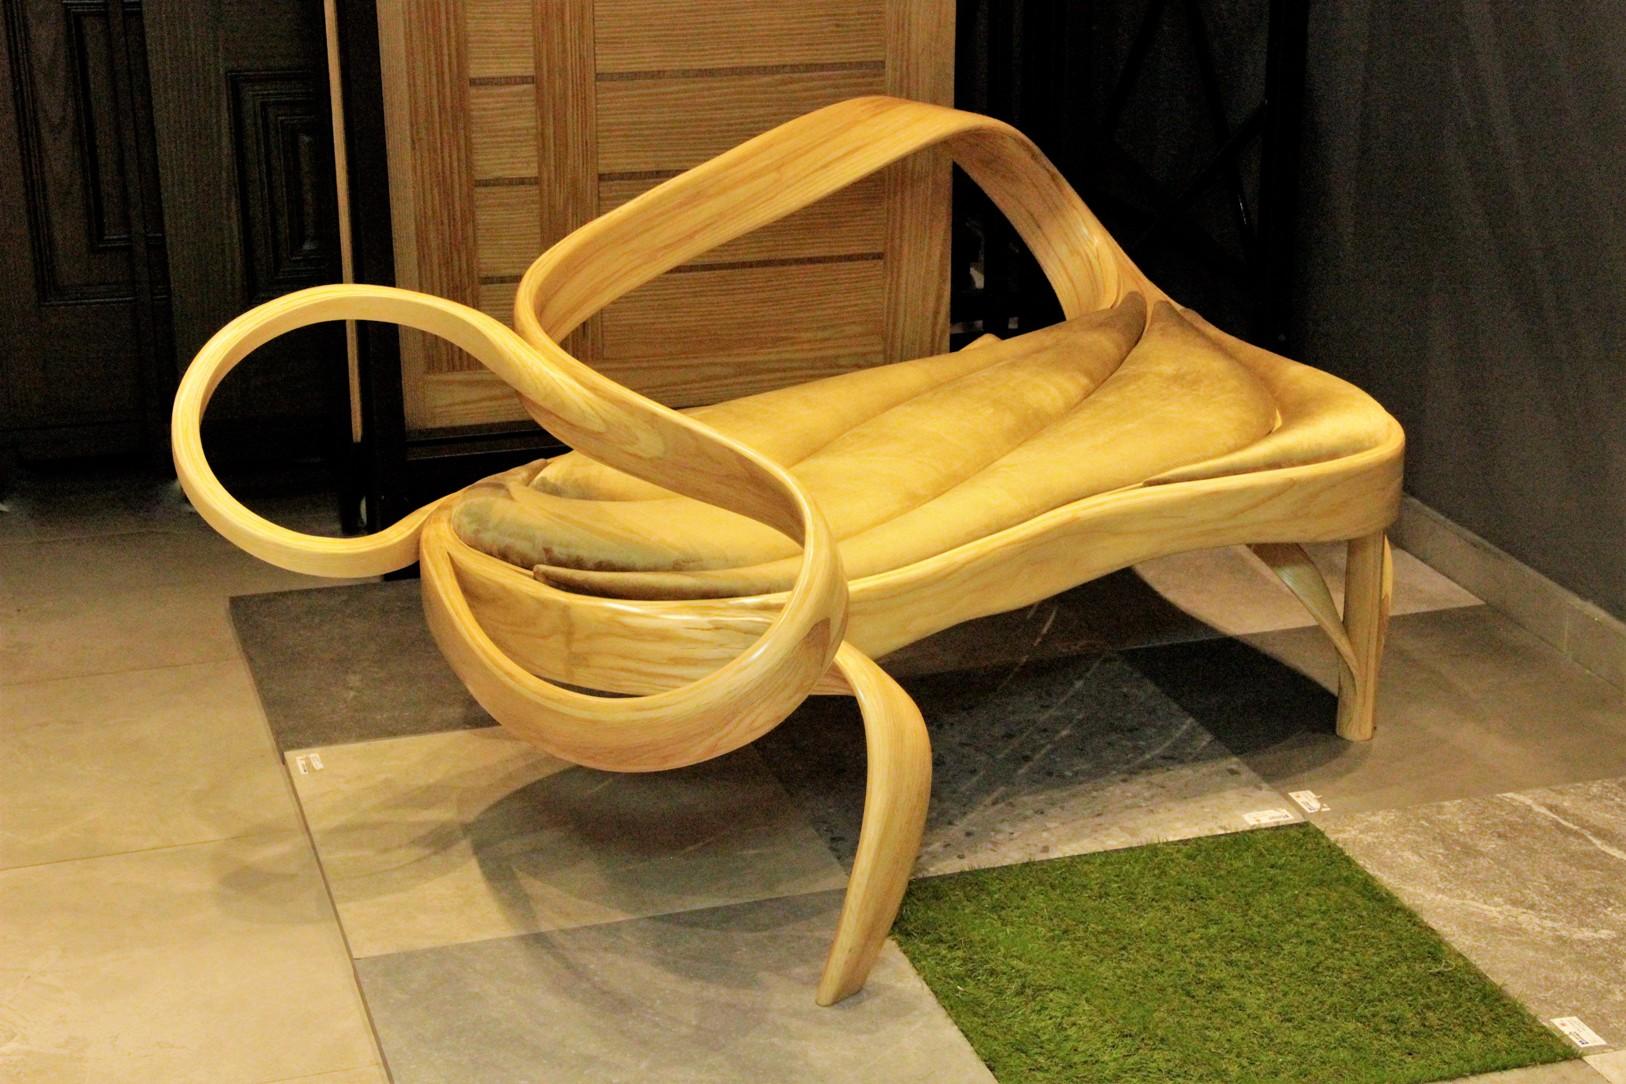 Raka Studio — Exceptional Wooden Furniture & Lighting from Pakistan